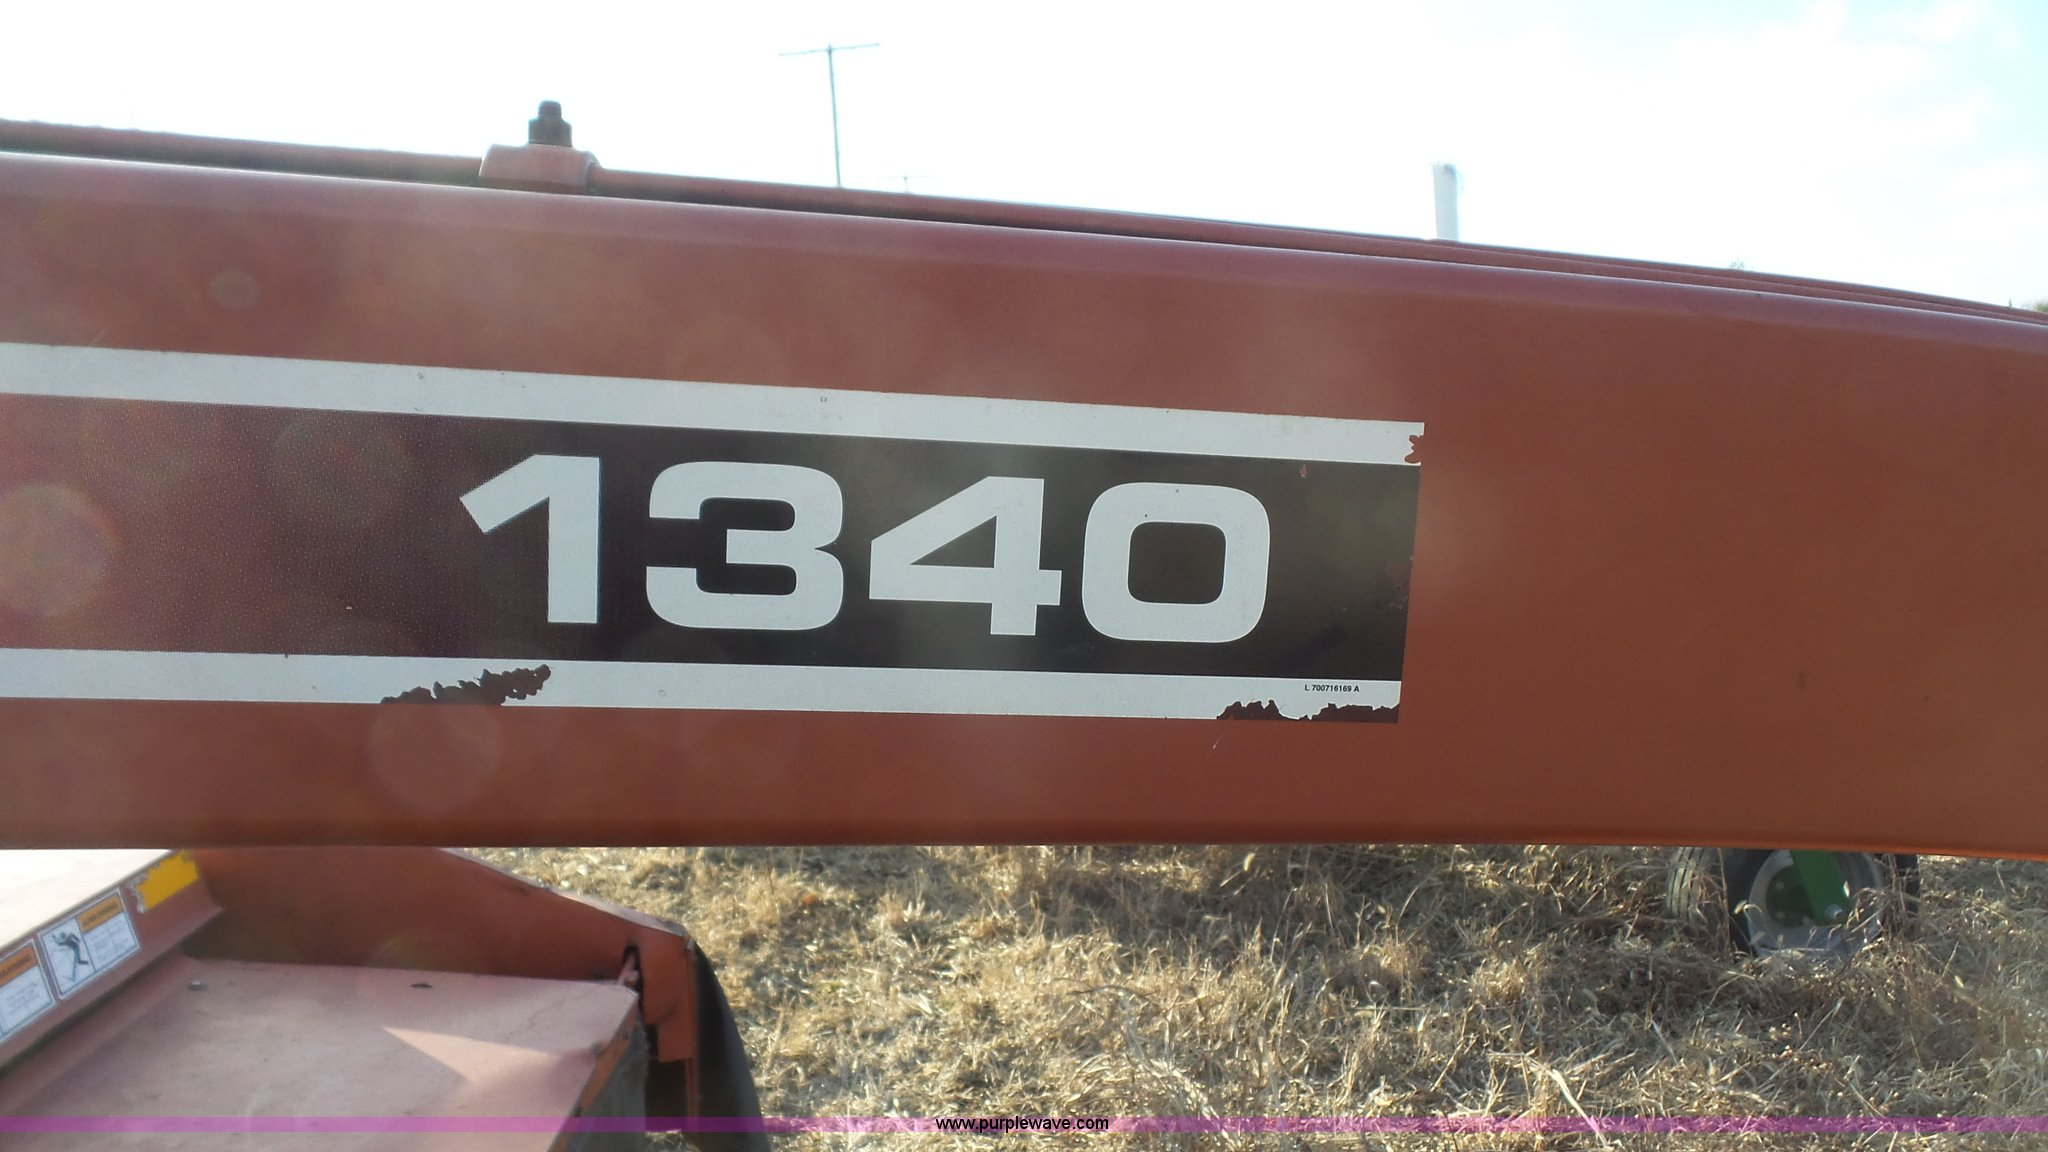 Hesston 1340 manual